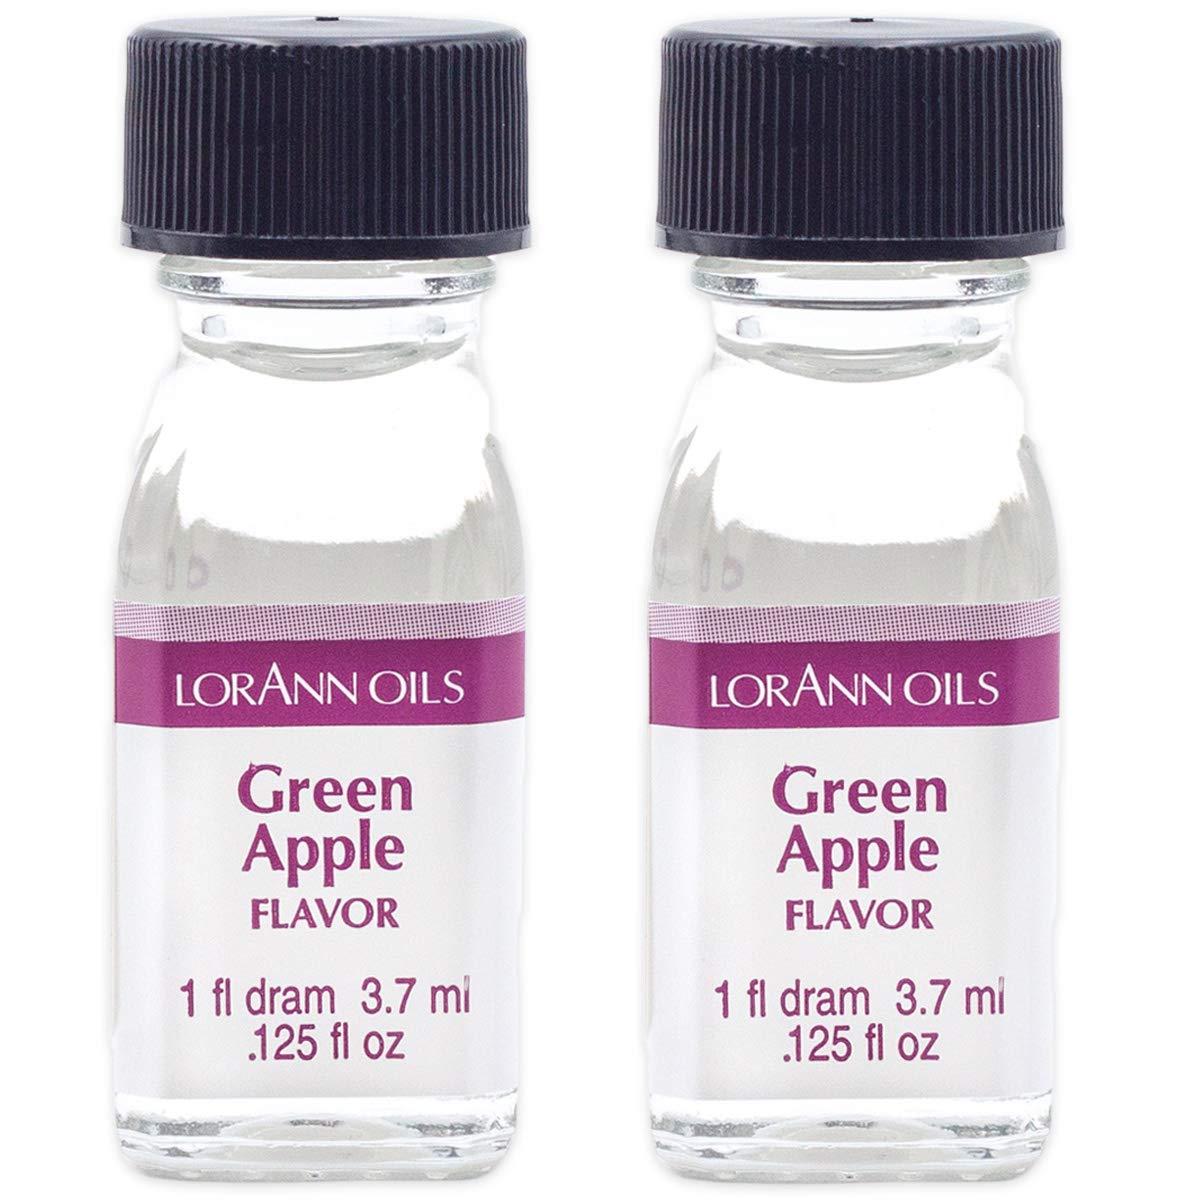 LorAnn Green Apple Super Strength Flavor, 1 dram bottle (.0125 fl oz - 3.7ml) - 2 pack